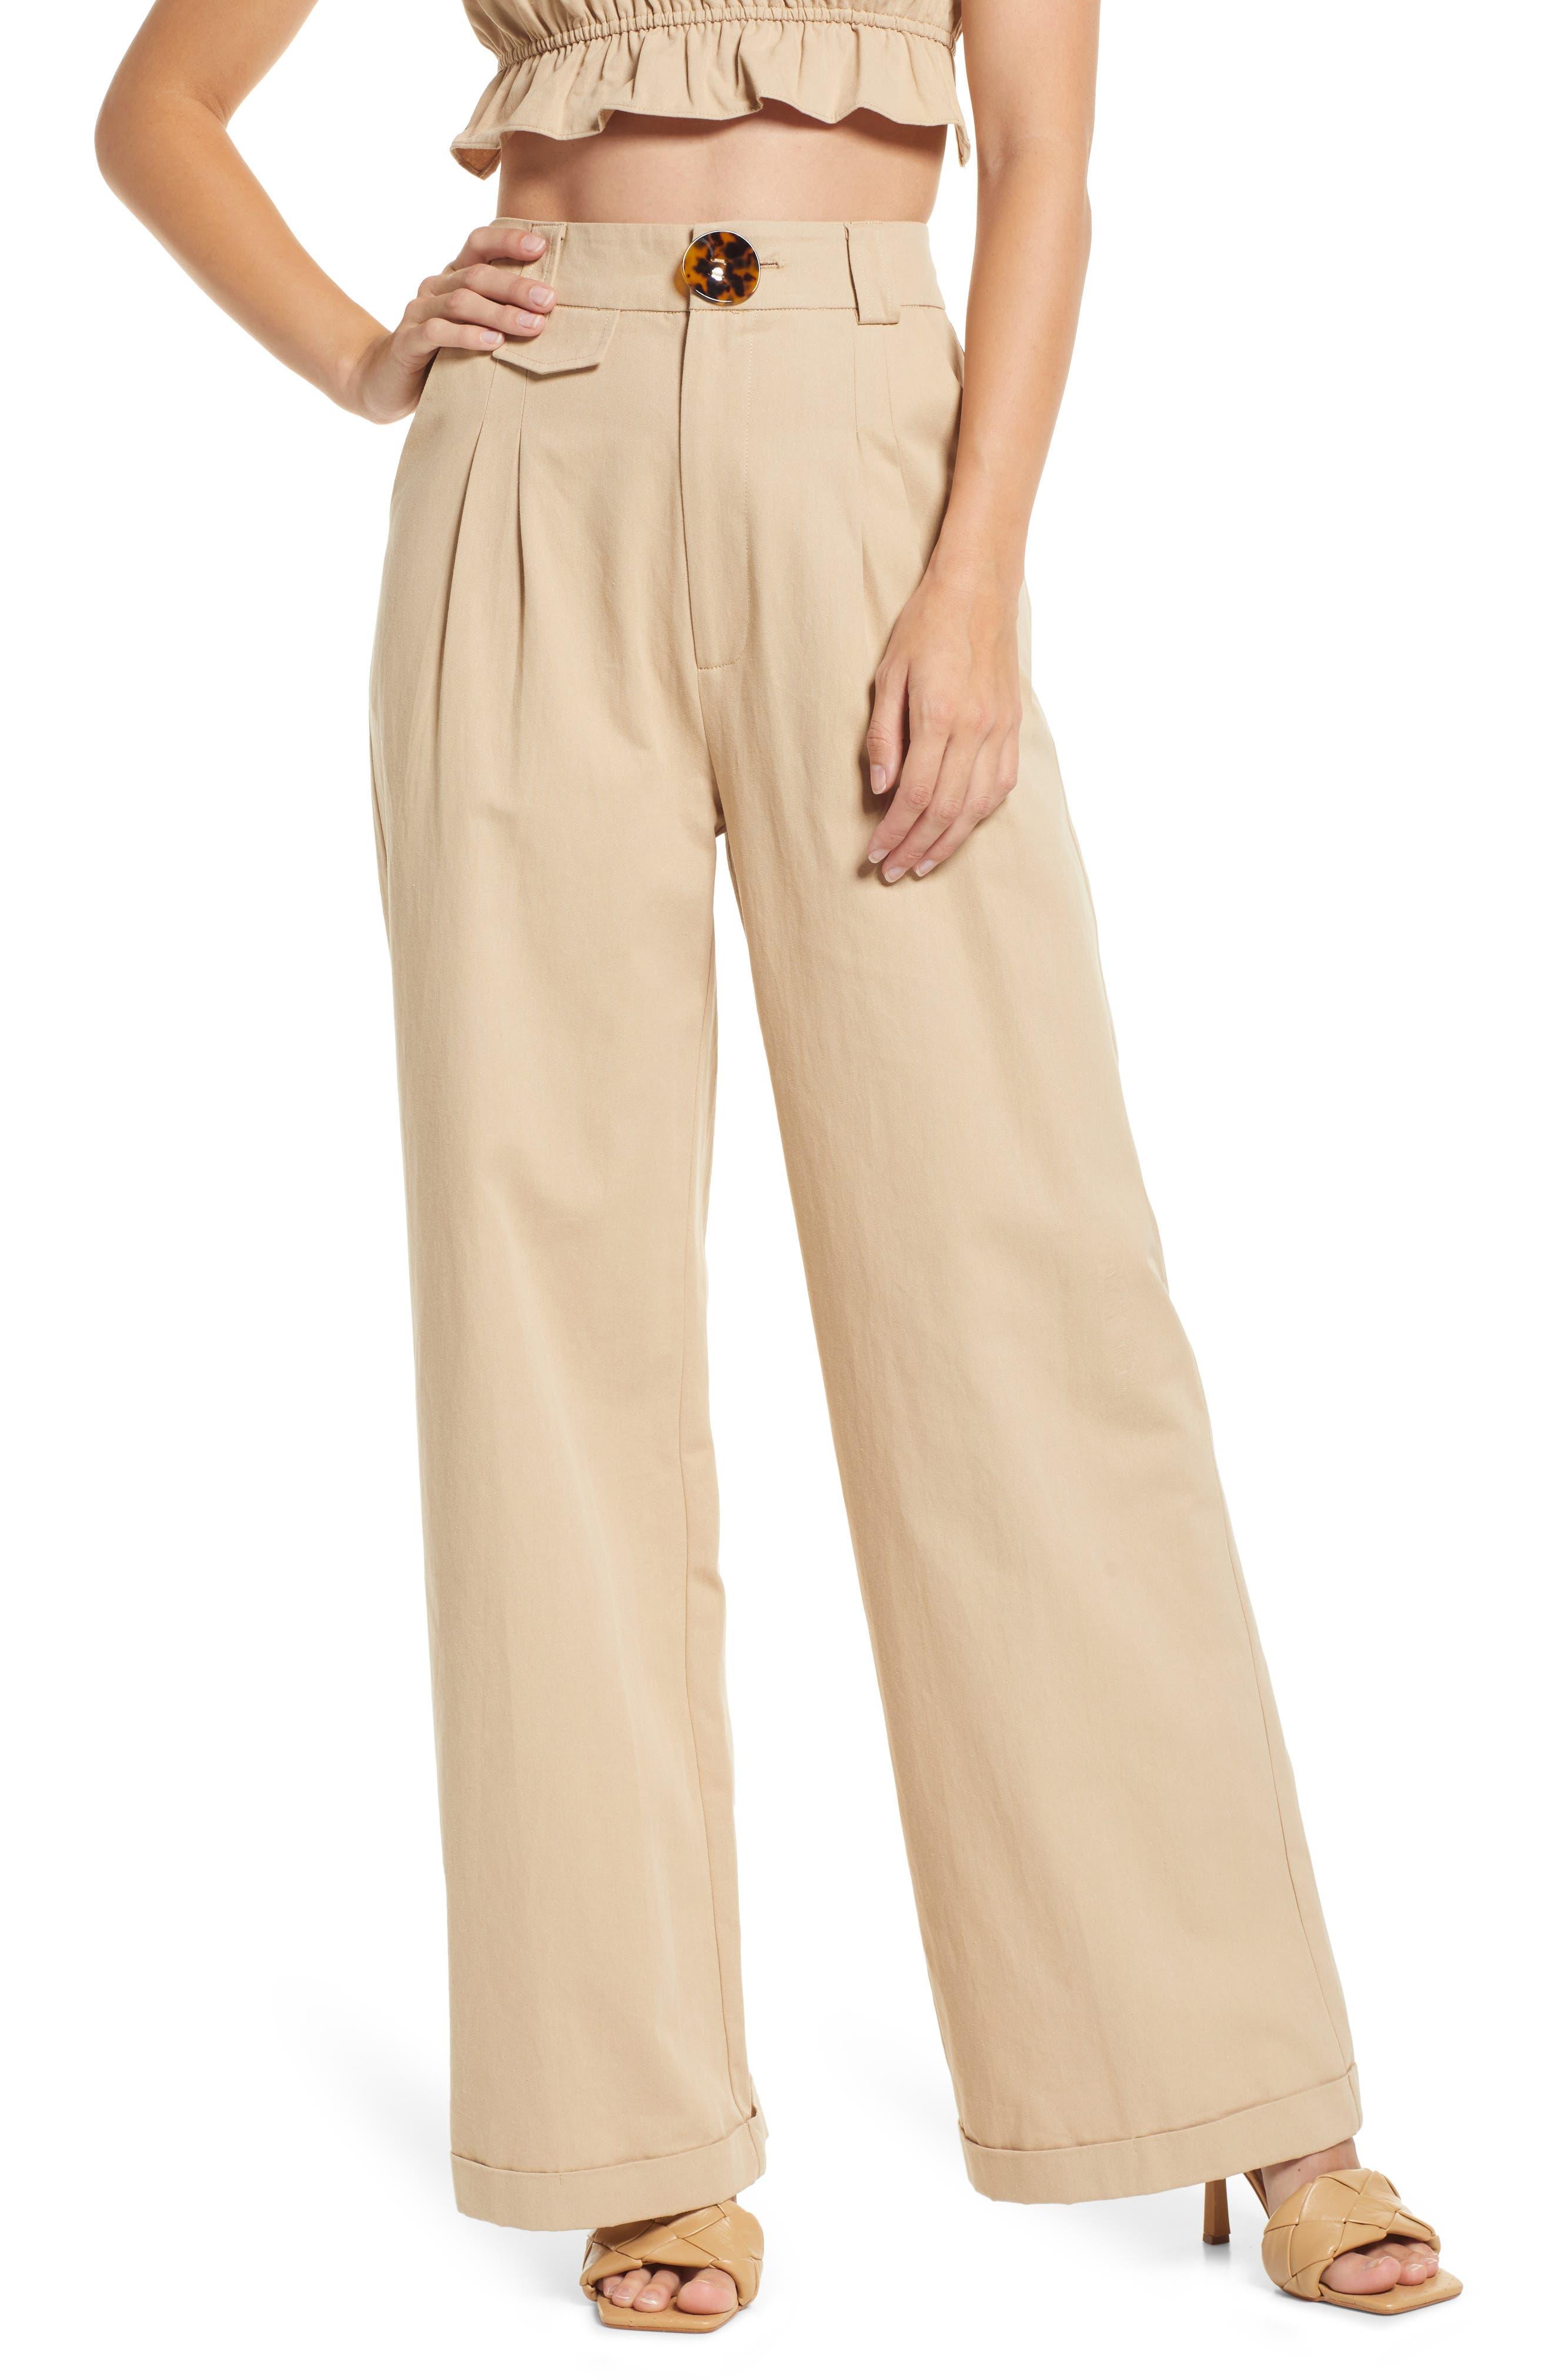 Seeking Adventures Wide Leg Cotton Pants